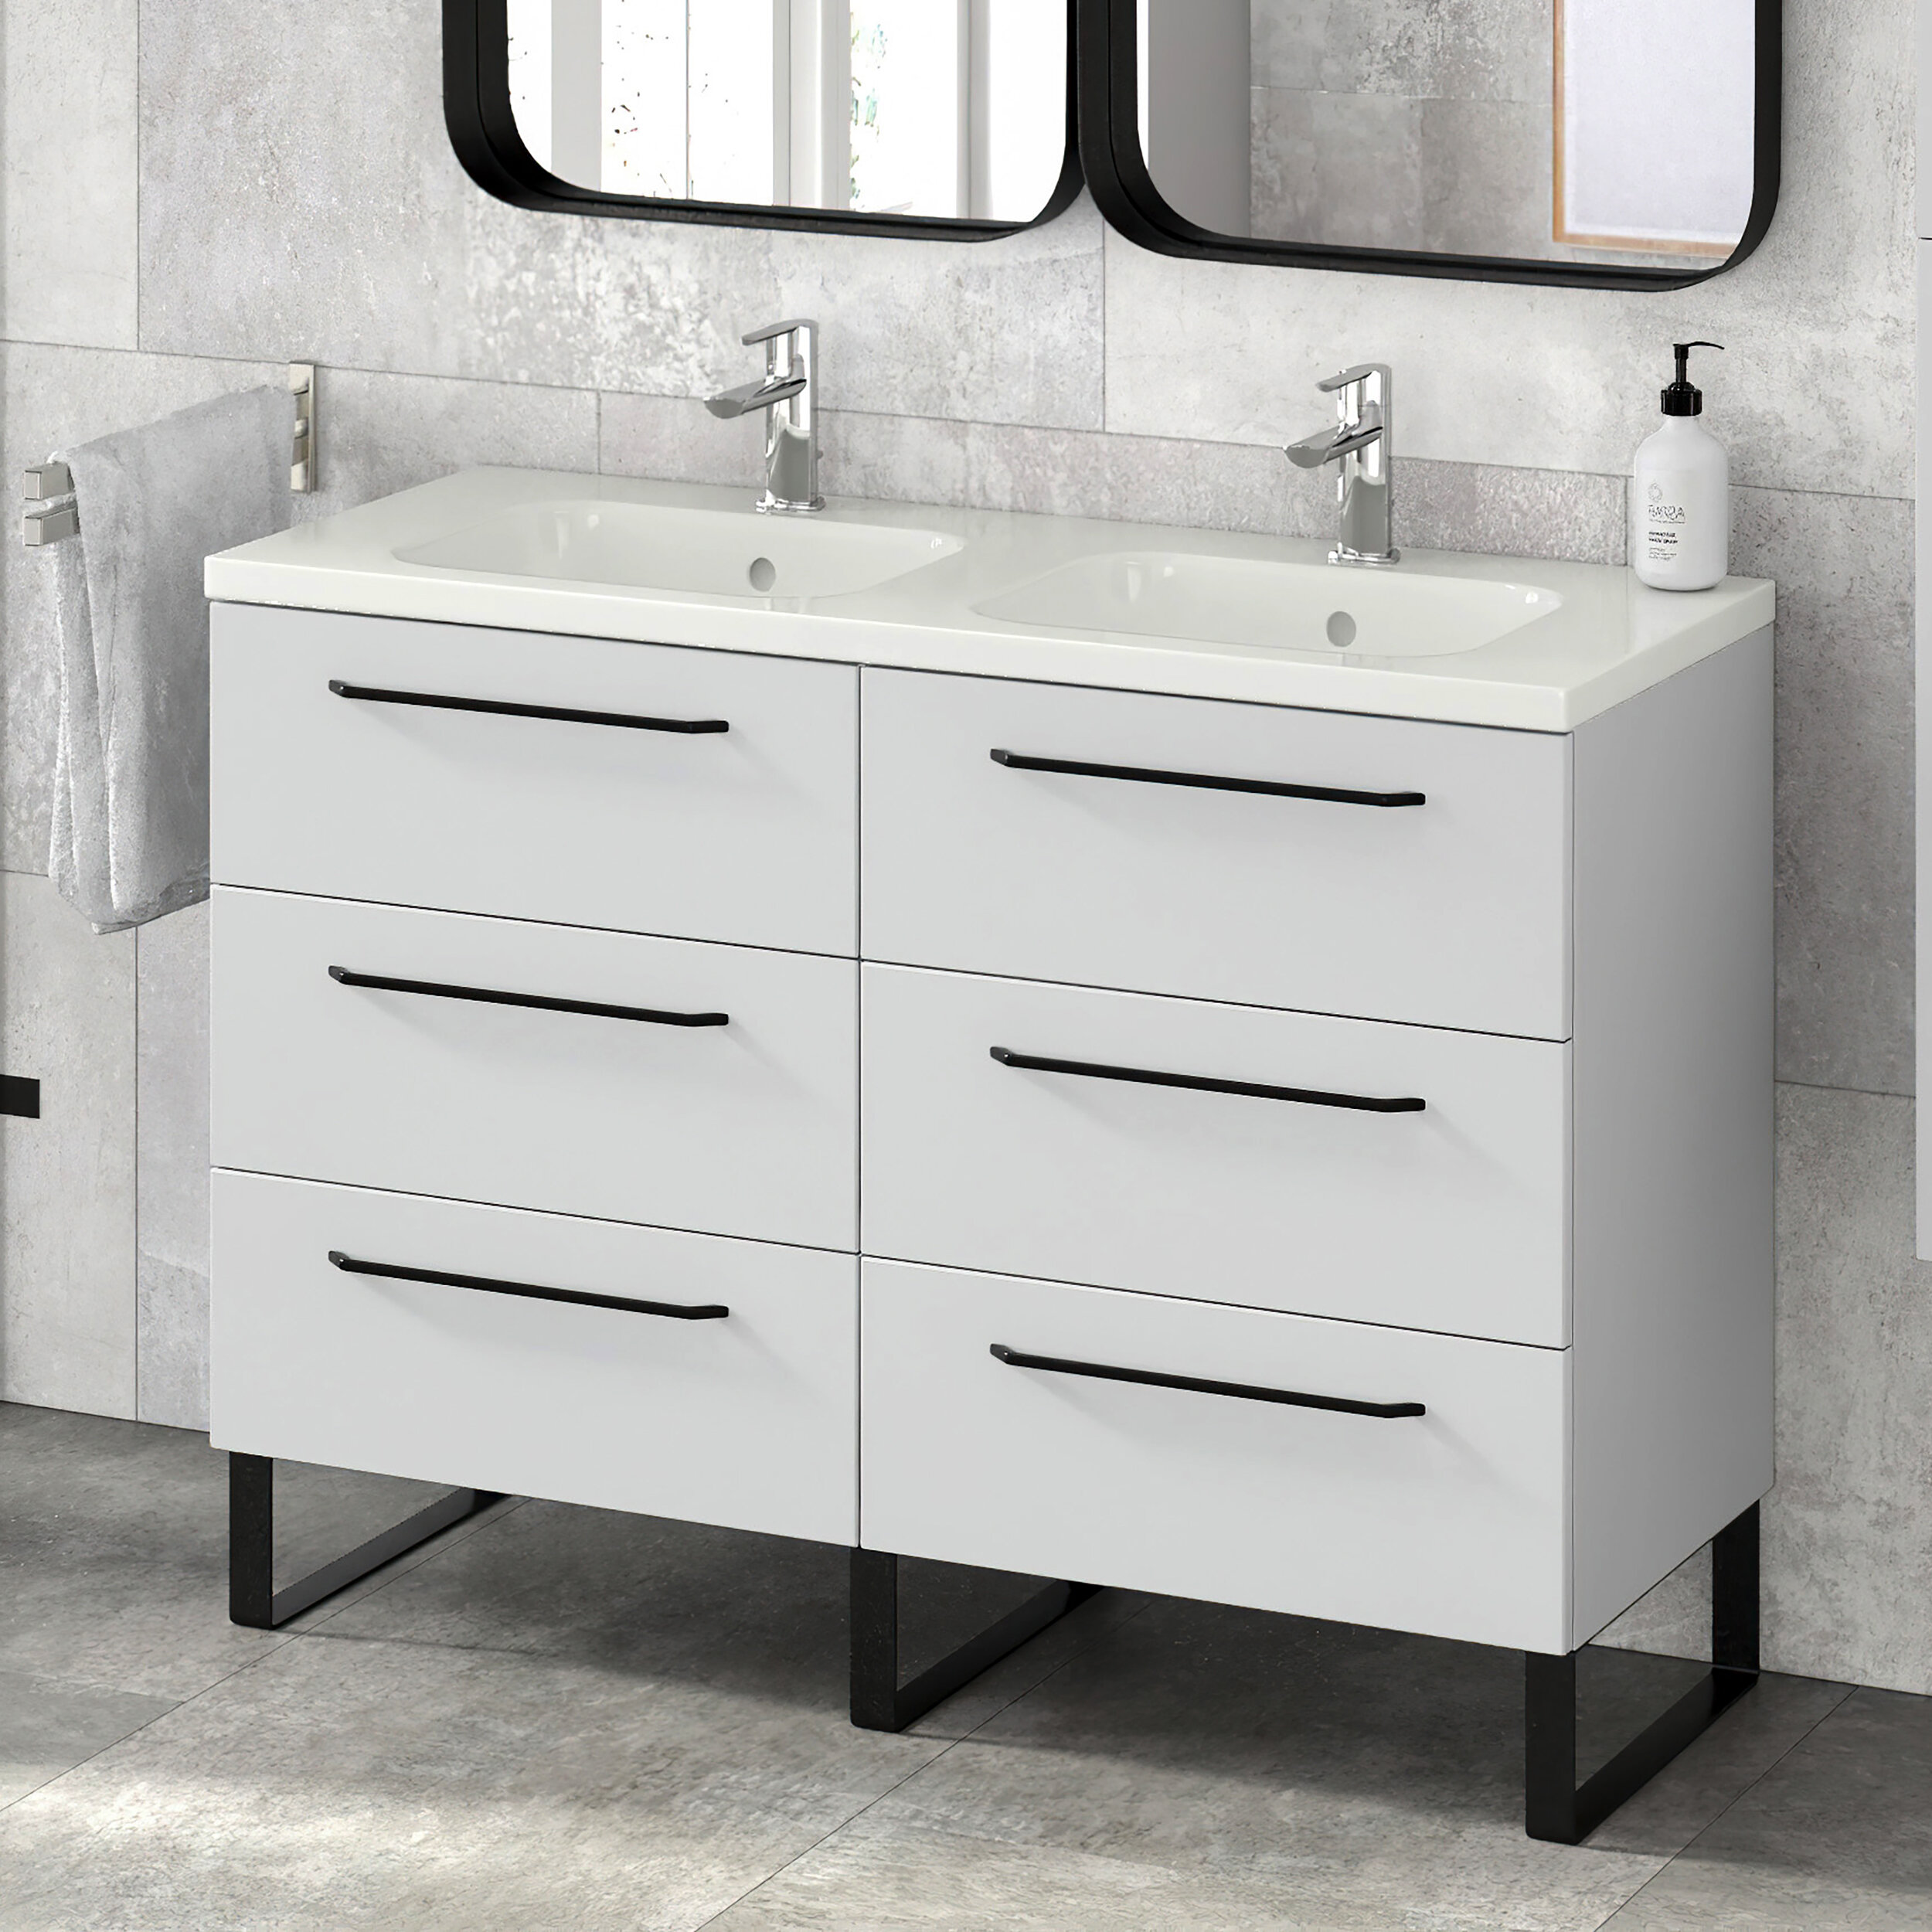 Double Made In Usa Bathroom Vanities You Ll Love In 2021 Wayfair